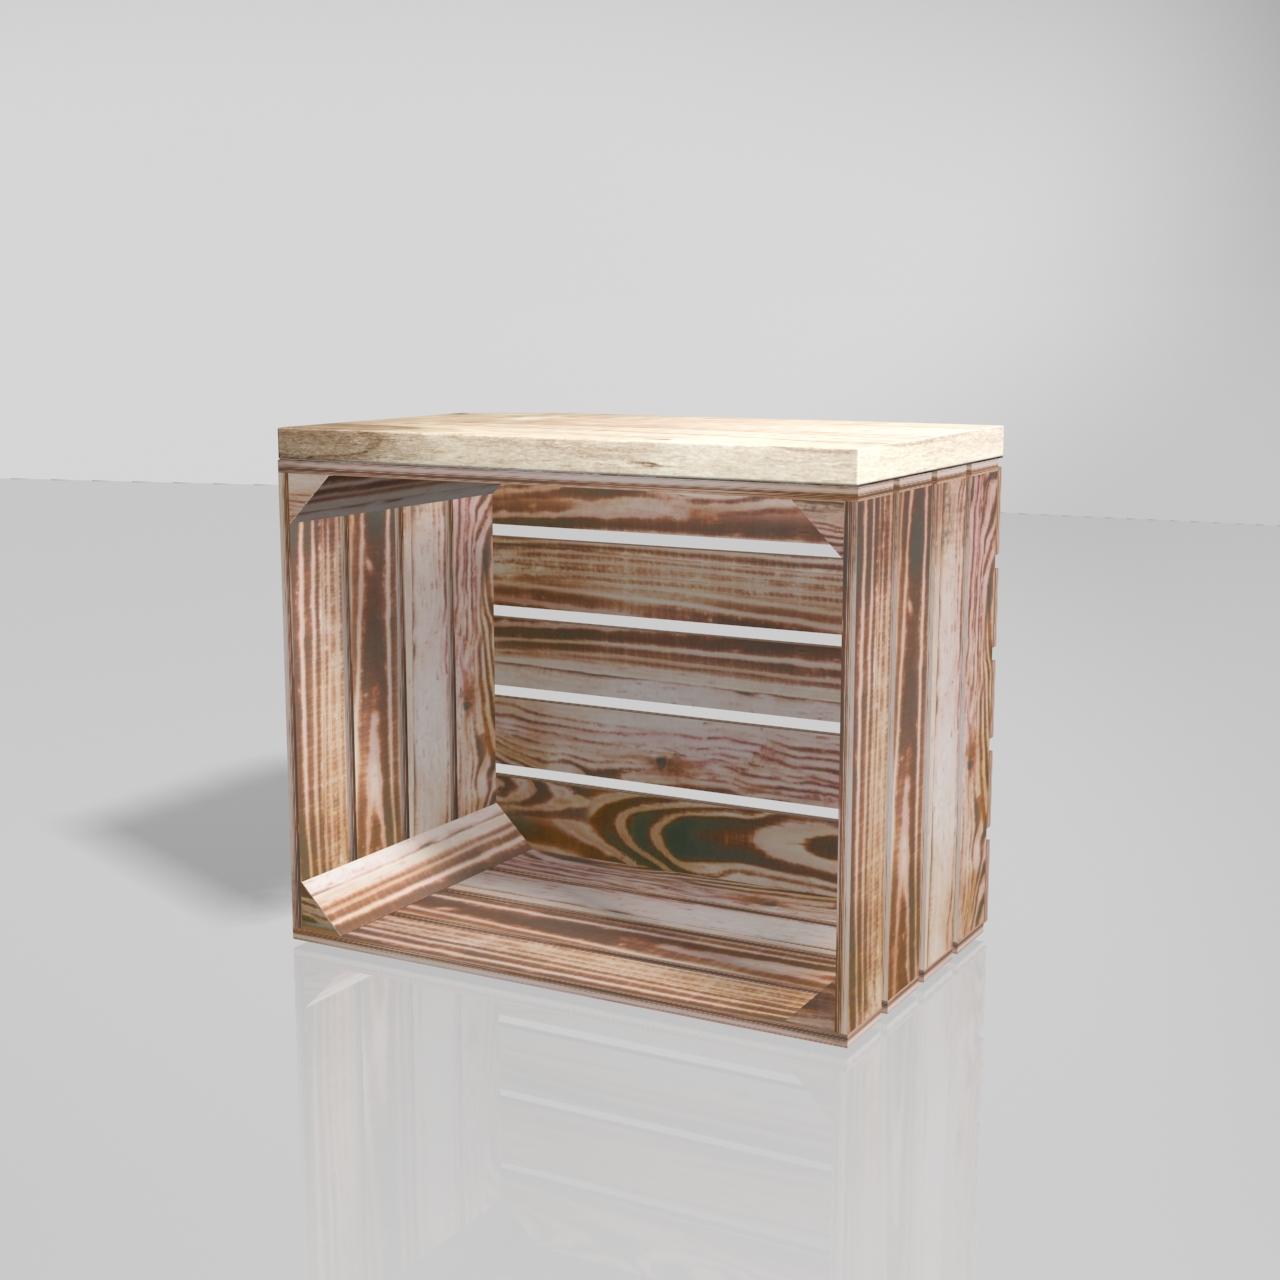 Obstkiste aus geflammtem Holz mit aufgesetztem Bohlenbrett in natur Optik 50x40x30cm